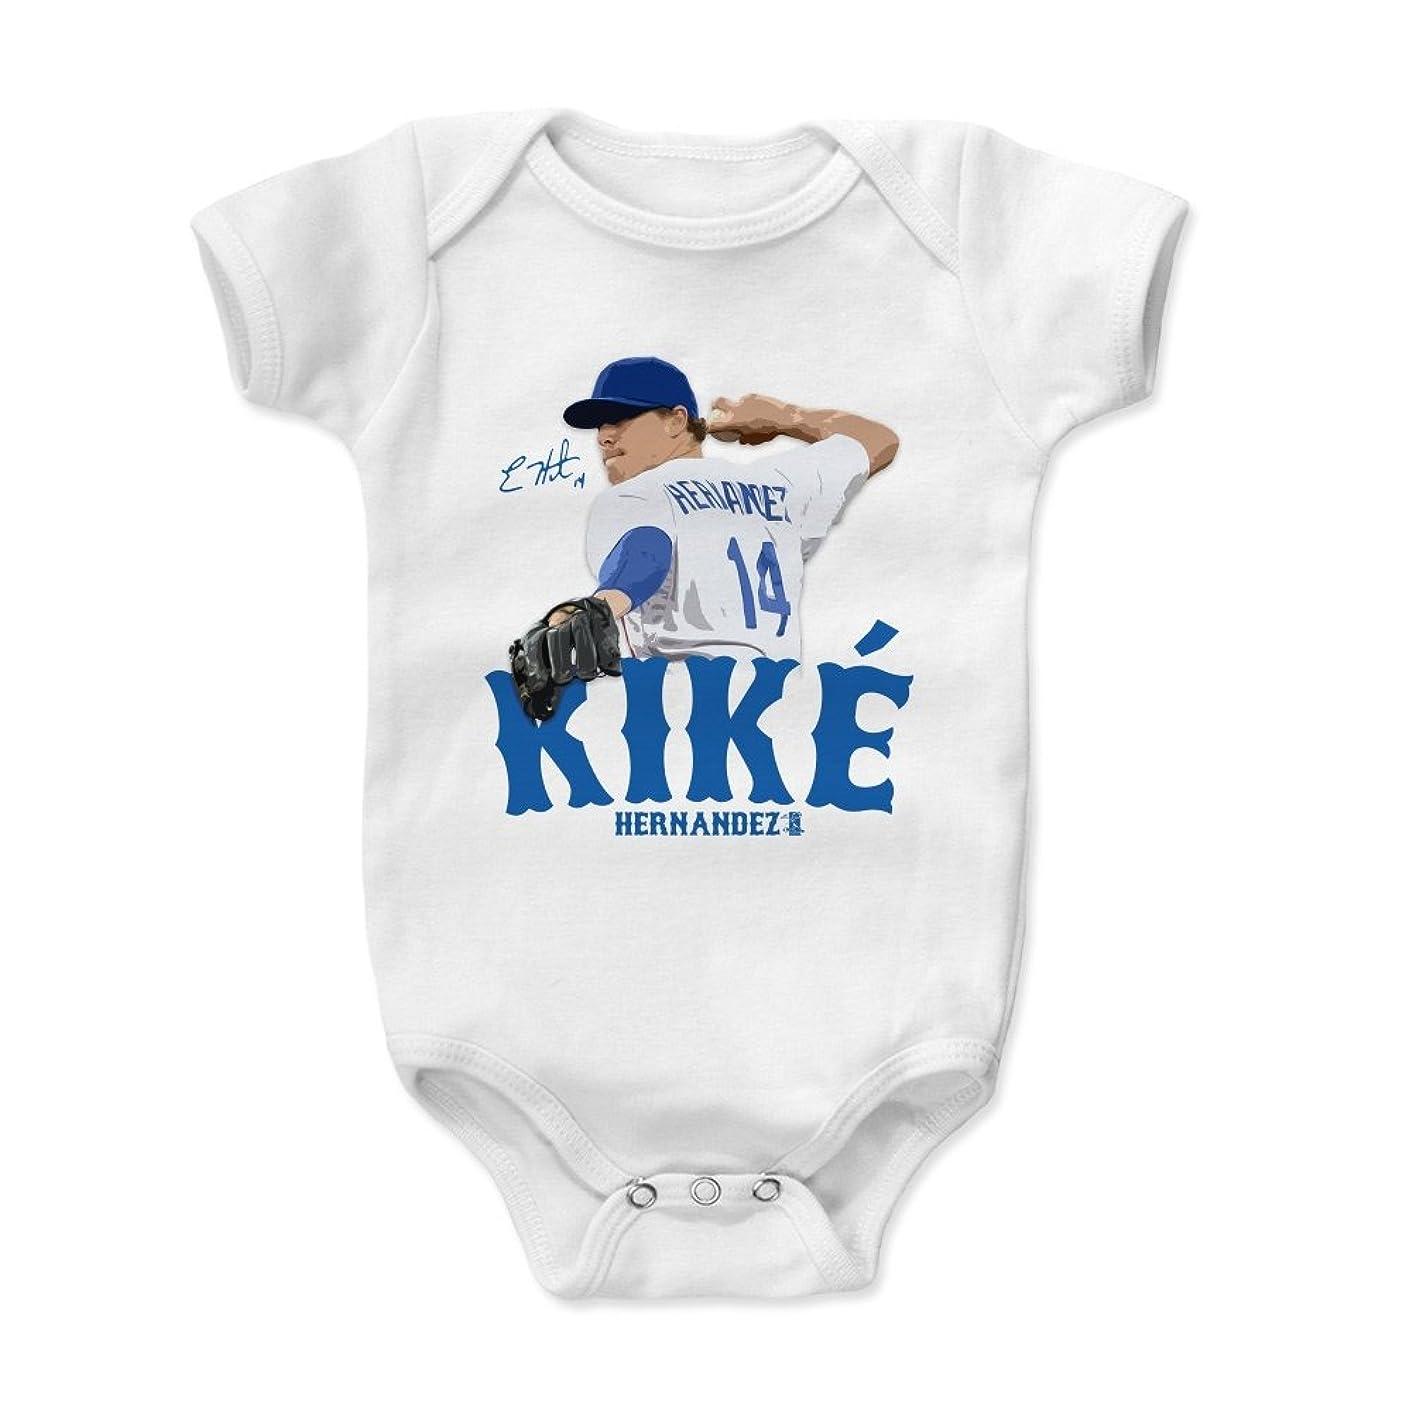 500 LEVEL Enrique Hernandez Baby Clothes & Onesie (3-6, 6-12, 12-18, 18-24 Months) - Los Angeles Baseball Baby Clothes - Enrique Hernandez Signature